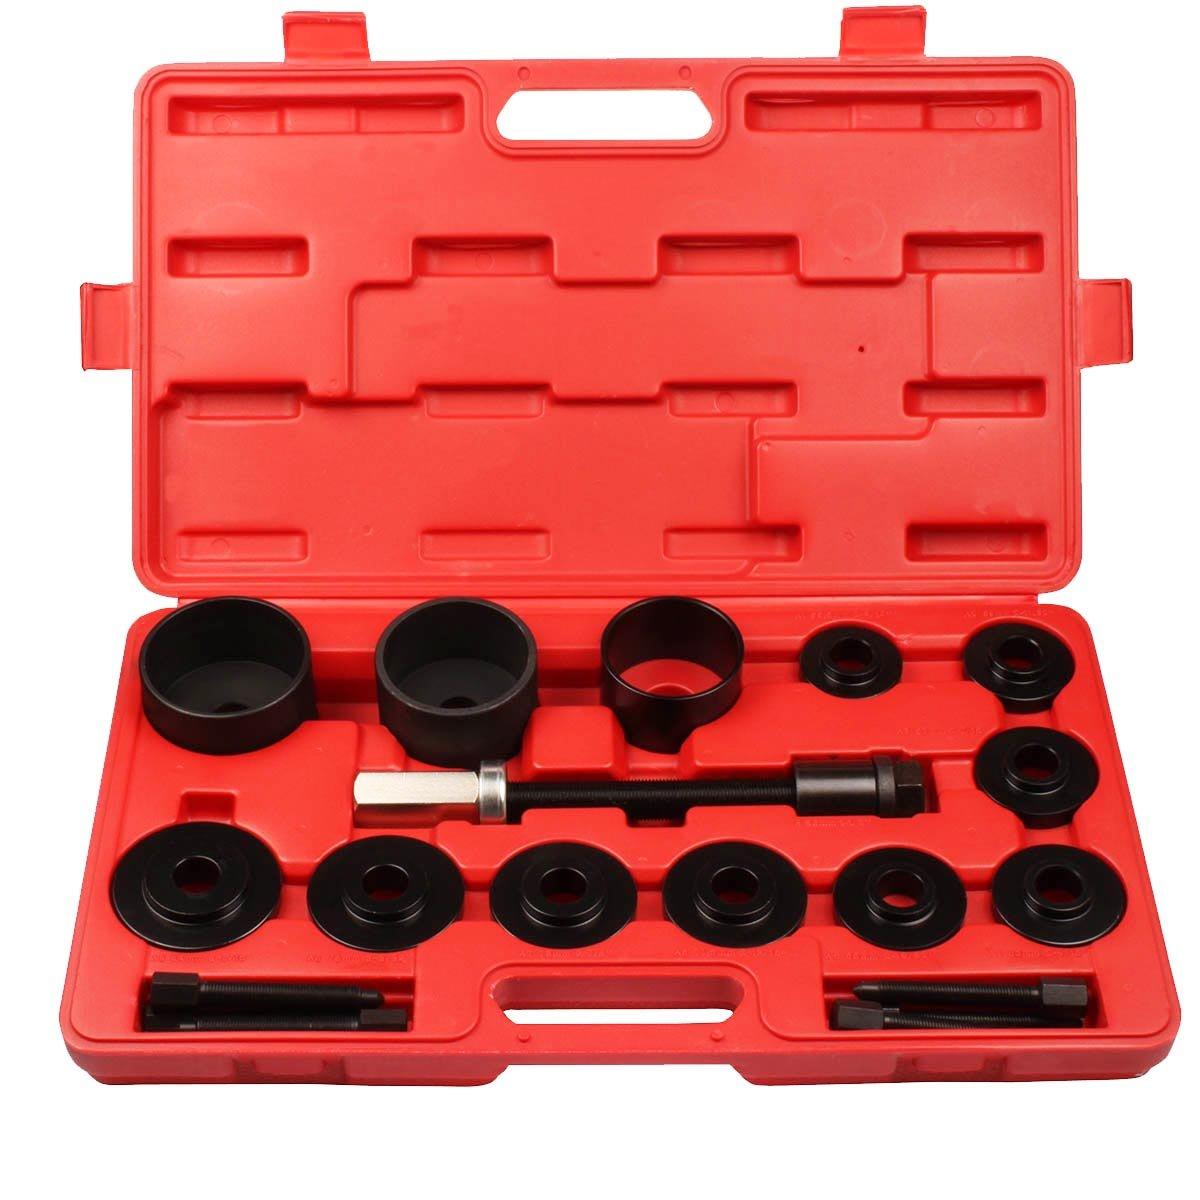 Qbace 17PCS Master Front Wheel Drive Bearing Service Kit